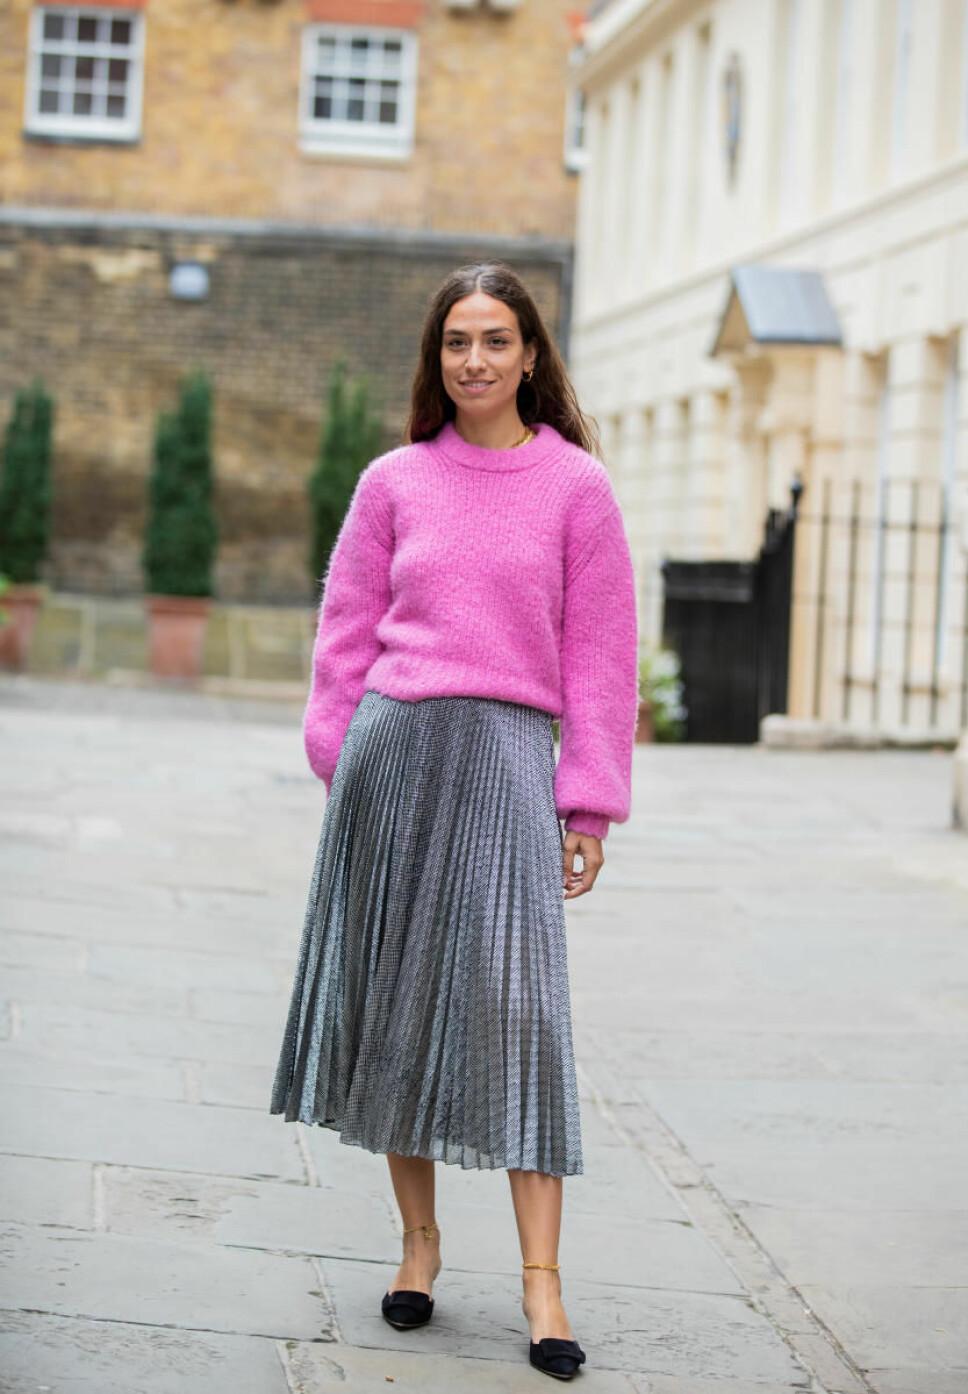 STYLISH: Erika Boldrin i rosa strikkekenser og sølvfarget plissé-skjørt under Lond Fashion Week 2019.